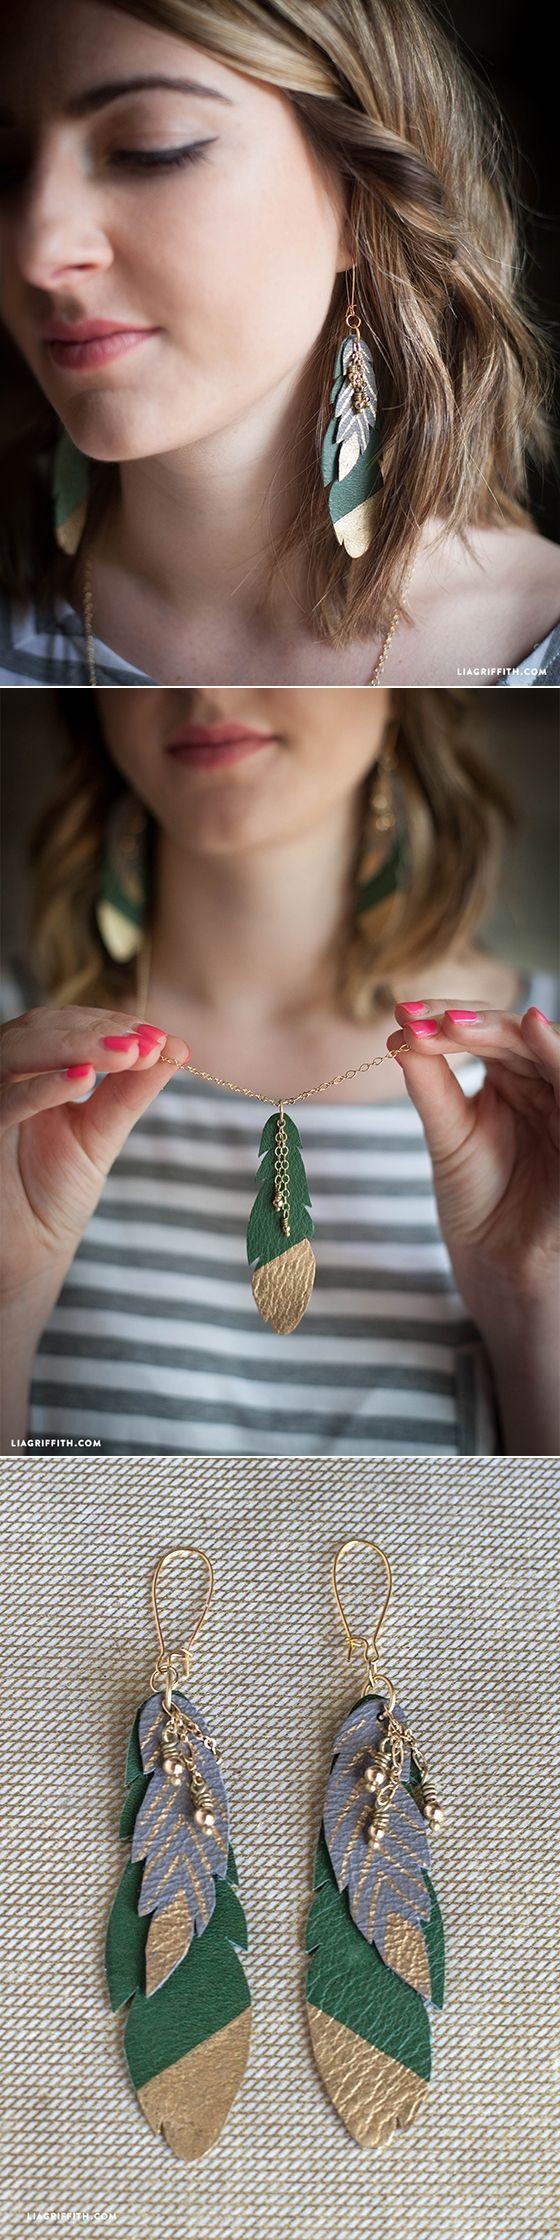 #boho #diyjewelry #featherjewelry www.LiaGriffith.com Lust darauf mit Schmuck Geld zu verdienen? www.silandu.de